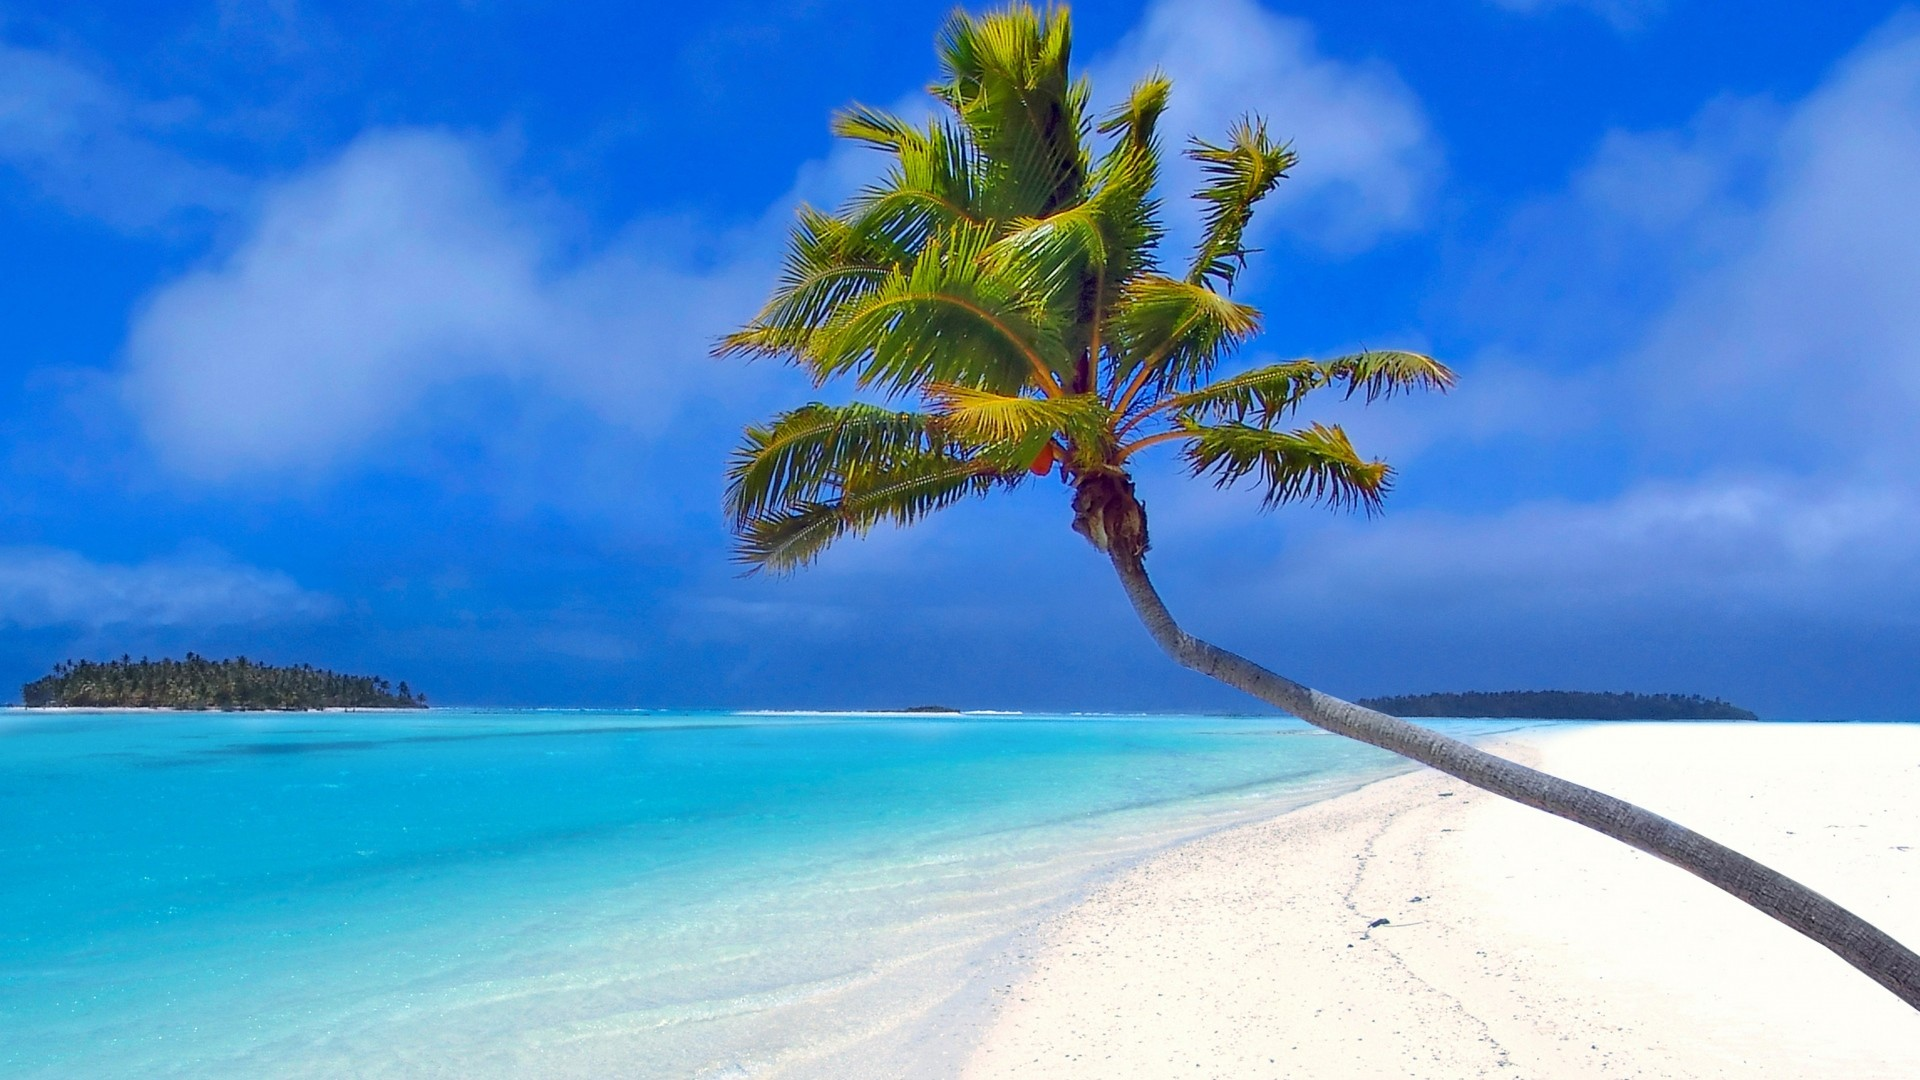 Preview wallpaper maldives, beach, palm trees, sand, sea 1920×1080